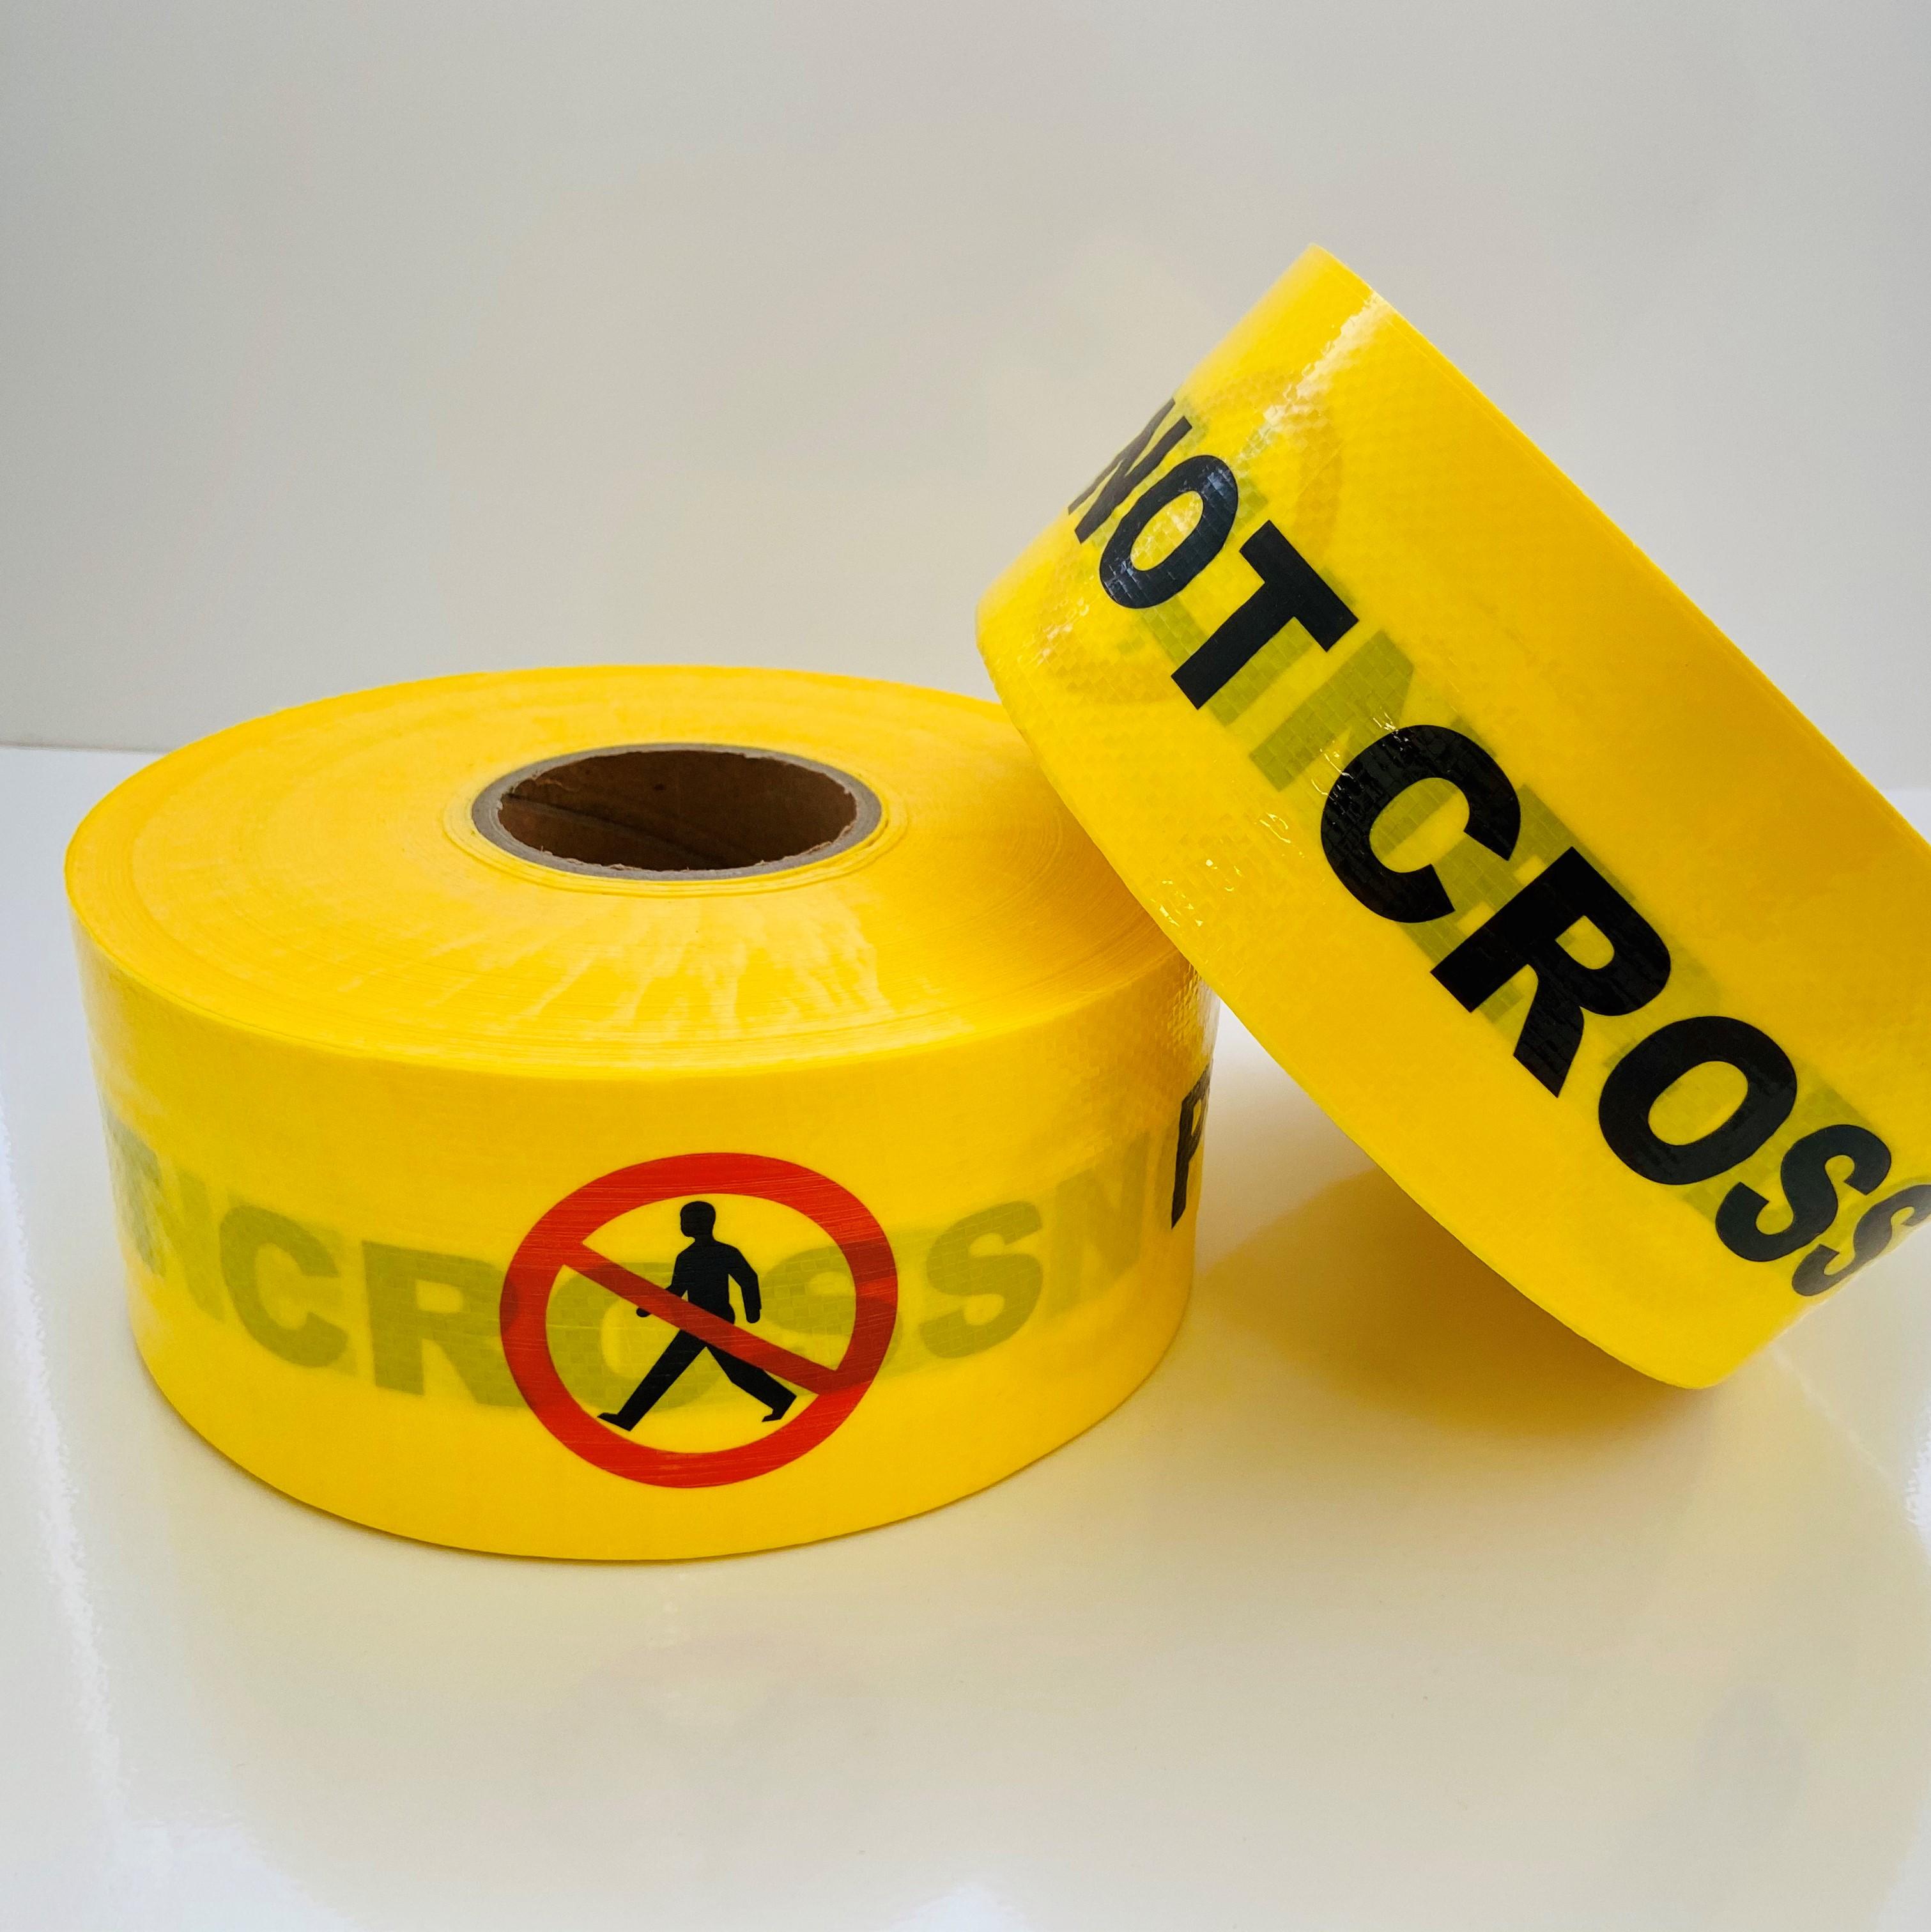 Images of Barricadetape barricade warning tape